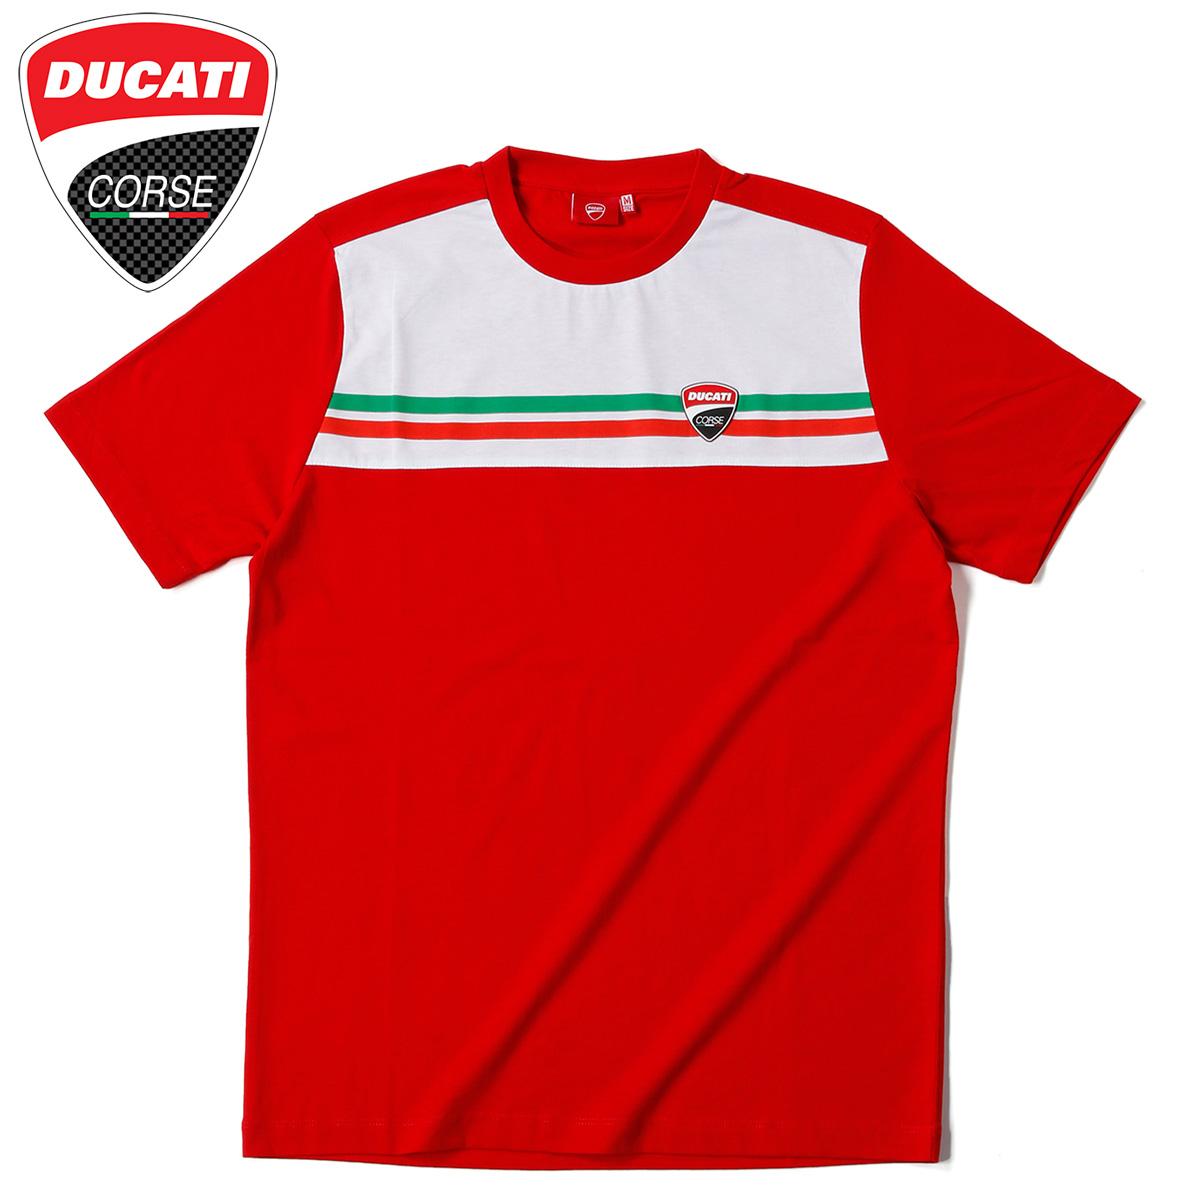 Ducati Scrambler Brooklyn Cafe Graphic Short Sleeve T-Shirt